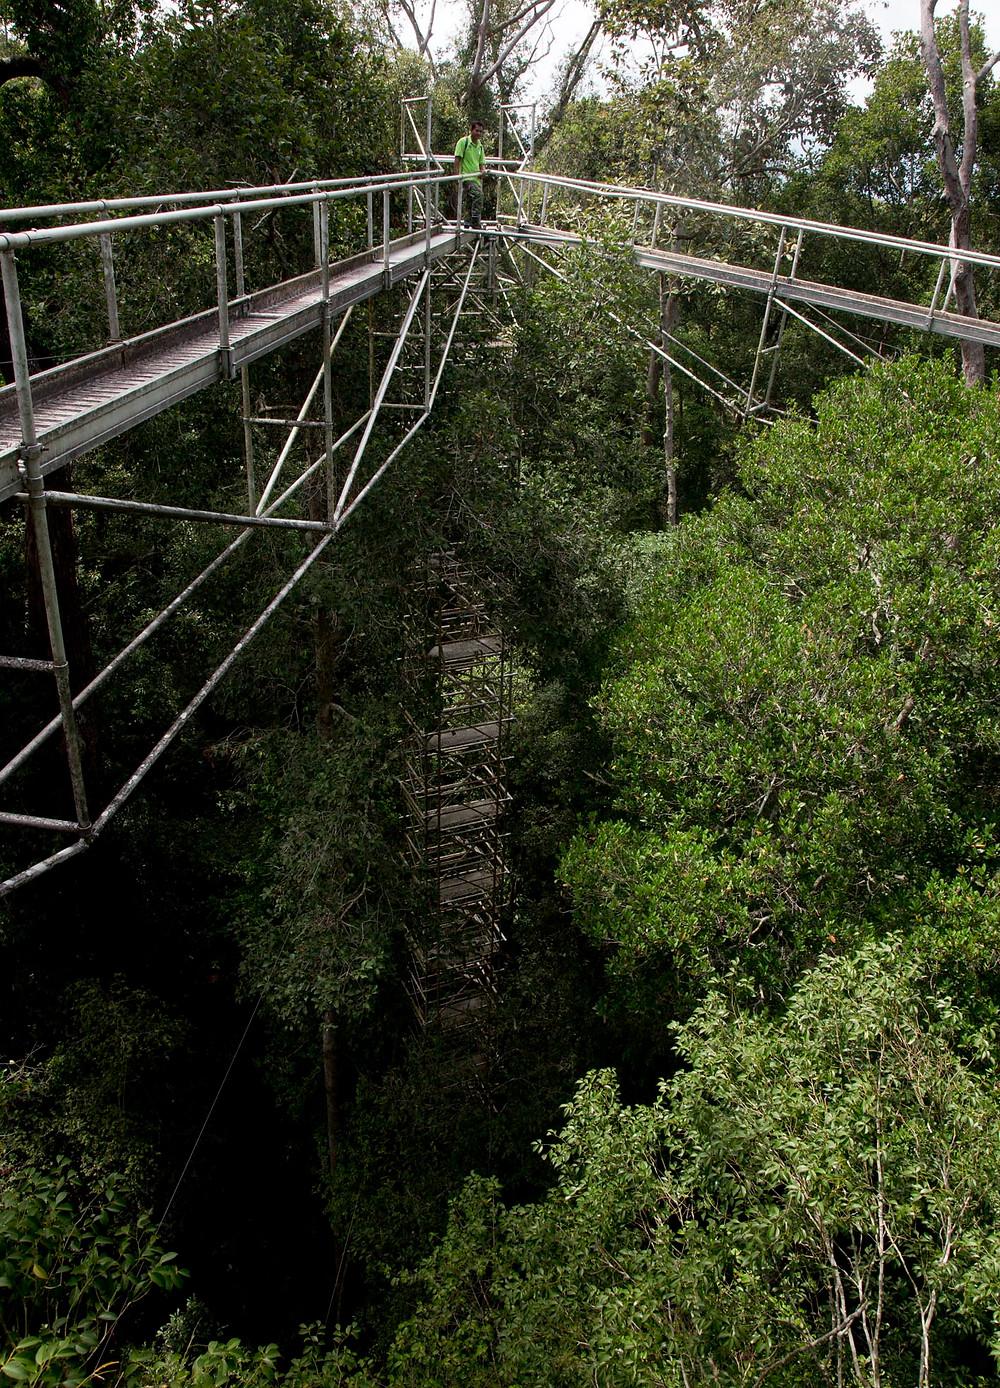 negeri sembilan photography nicaliss seremban photographer serembanonline FRIM Nic Falconer canopy walkway at FRIM